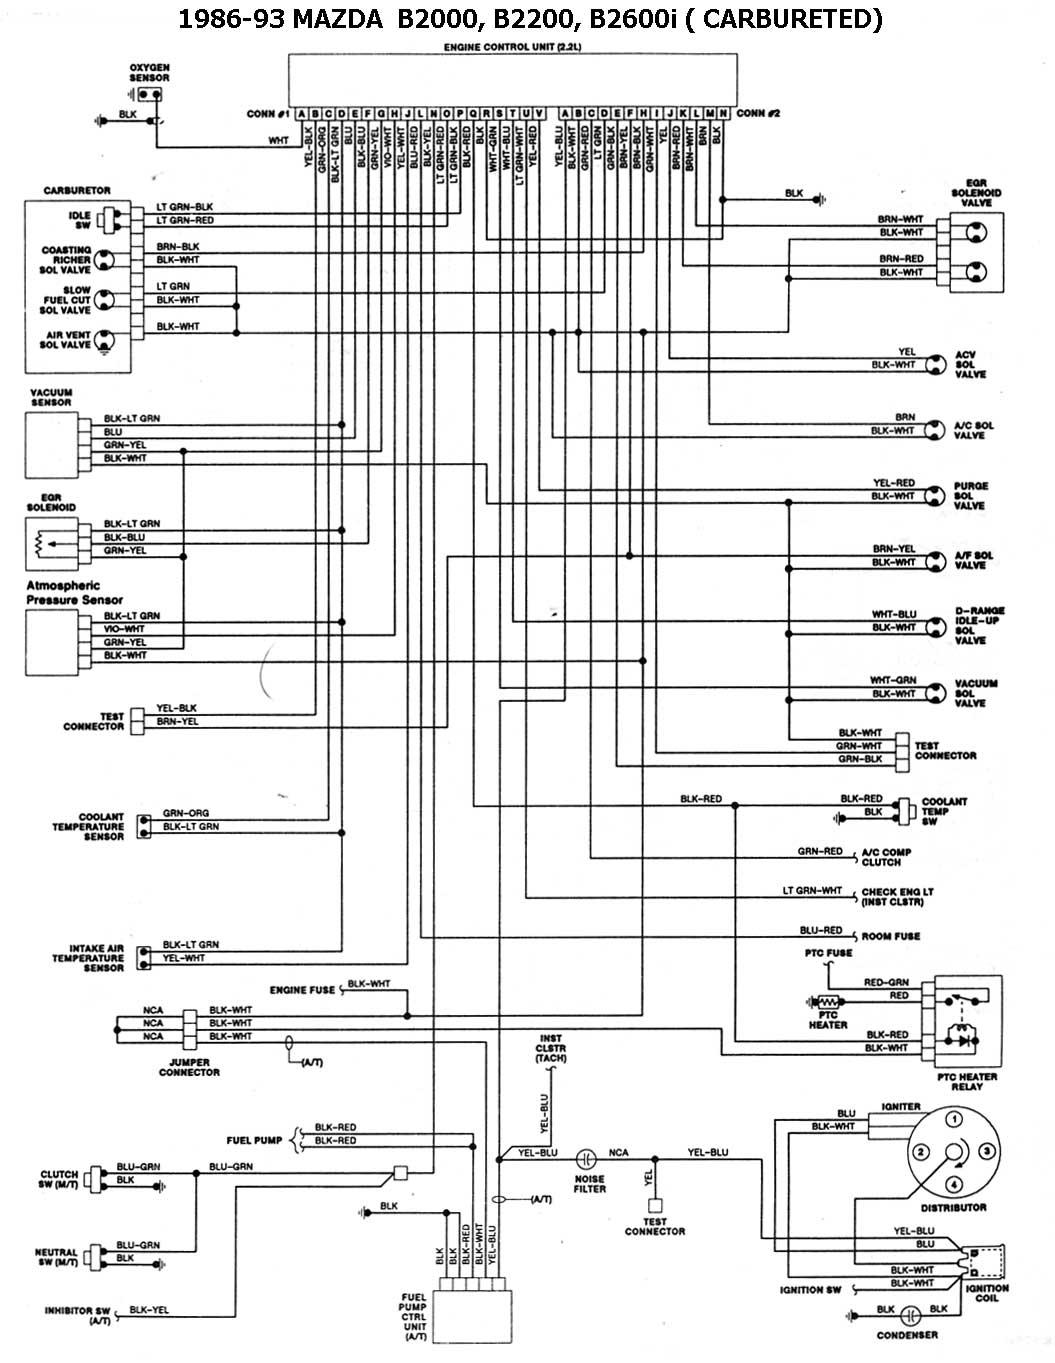 92 Accord Fuse Box Mazda 1986 93 Diagramas Esquemas Ubic De Comp